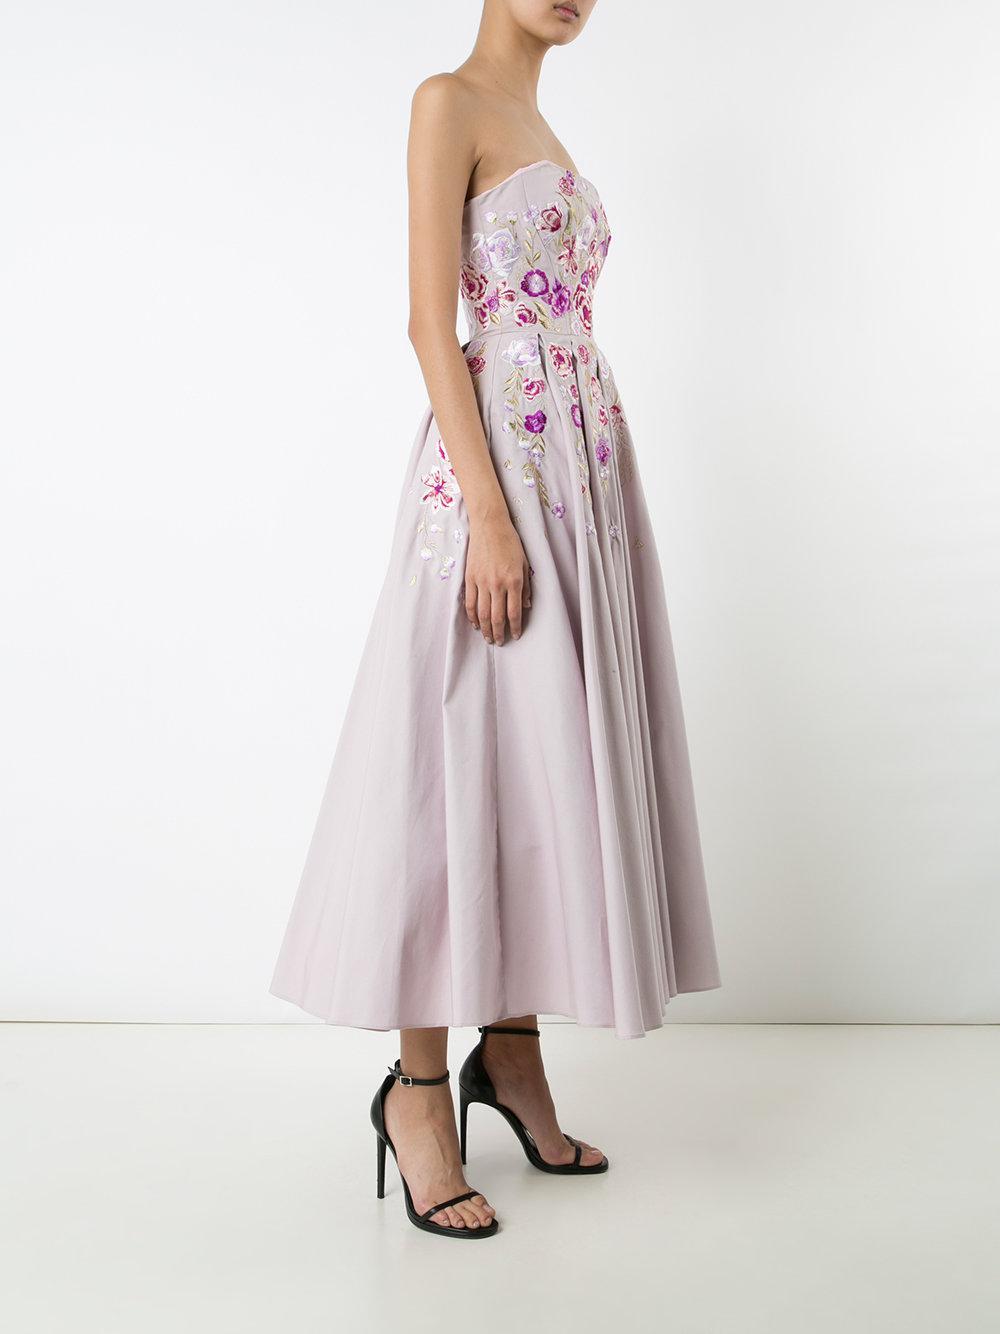 Marchesa notte Cotton Strapless Floral Print Dress in Pink & Purple (Pink)